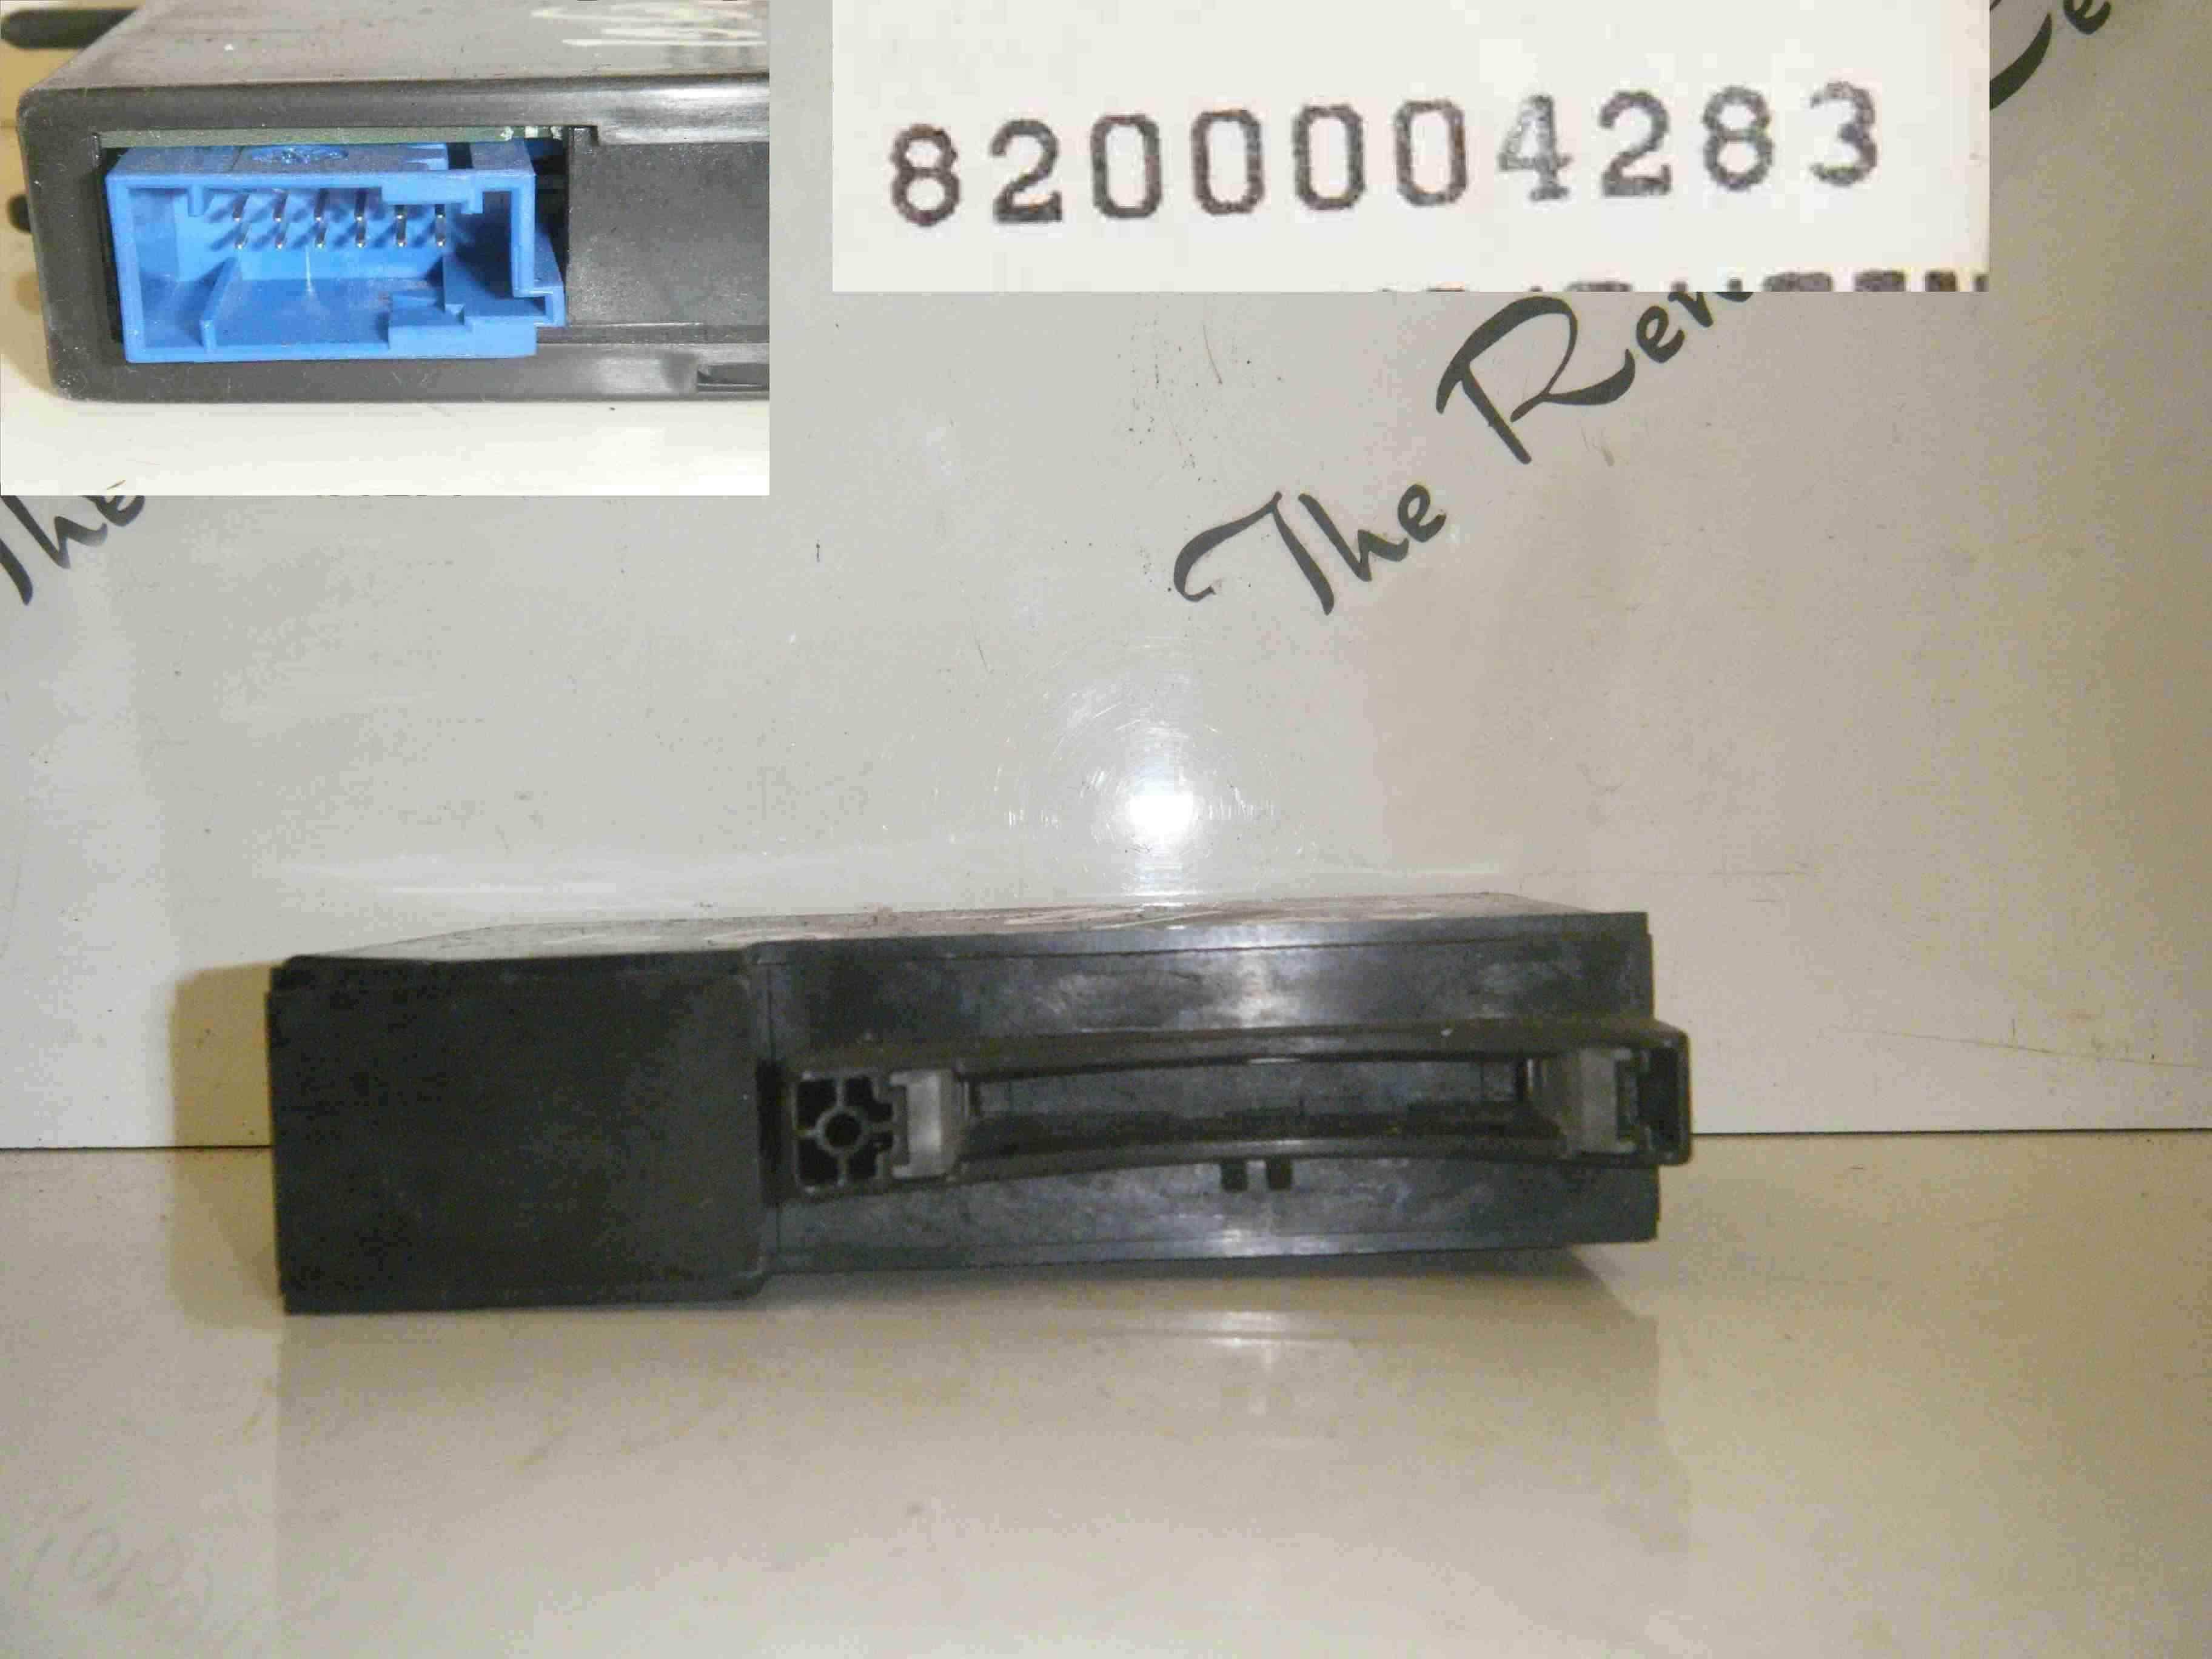 Renault Laguna 2001-2005 Ignition Key Card Reader Receiver 8200004283